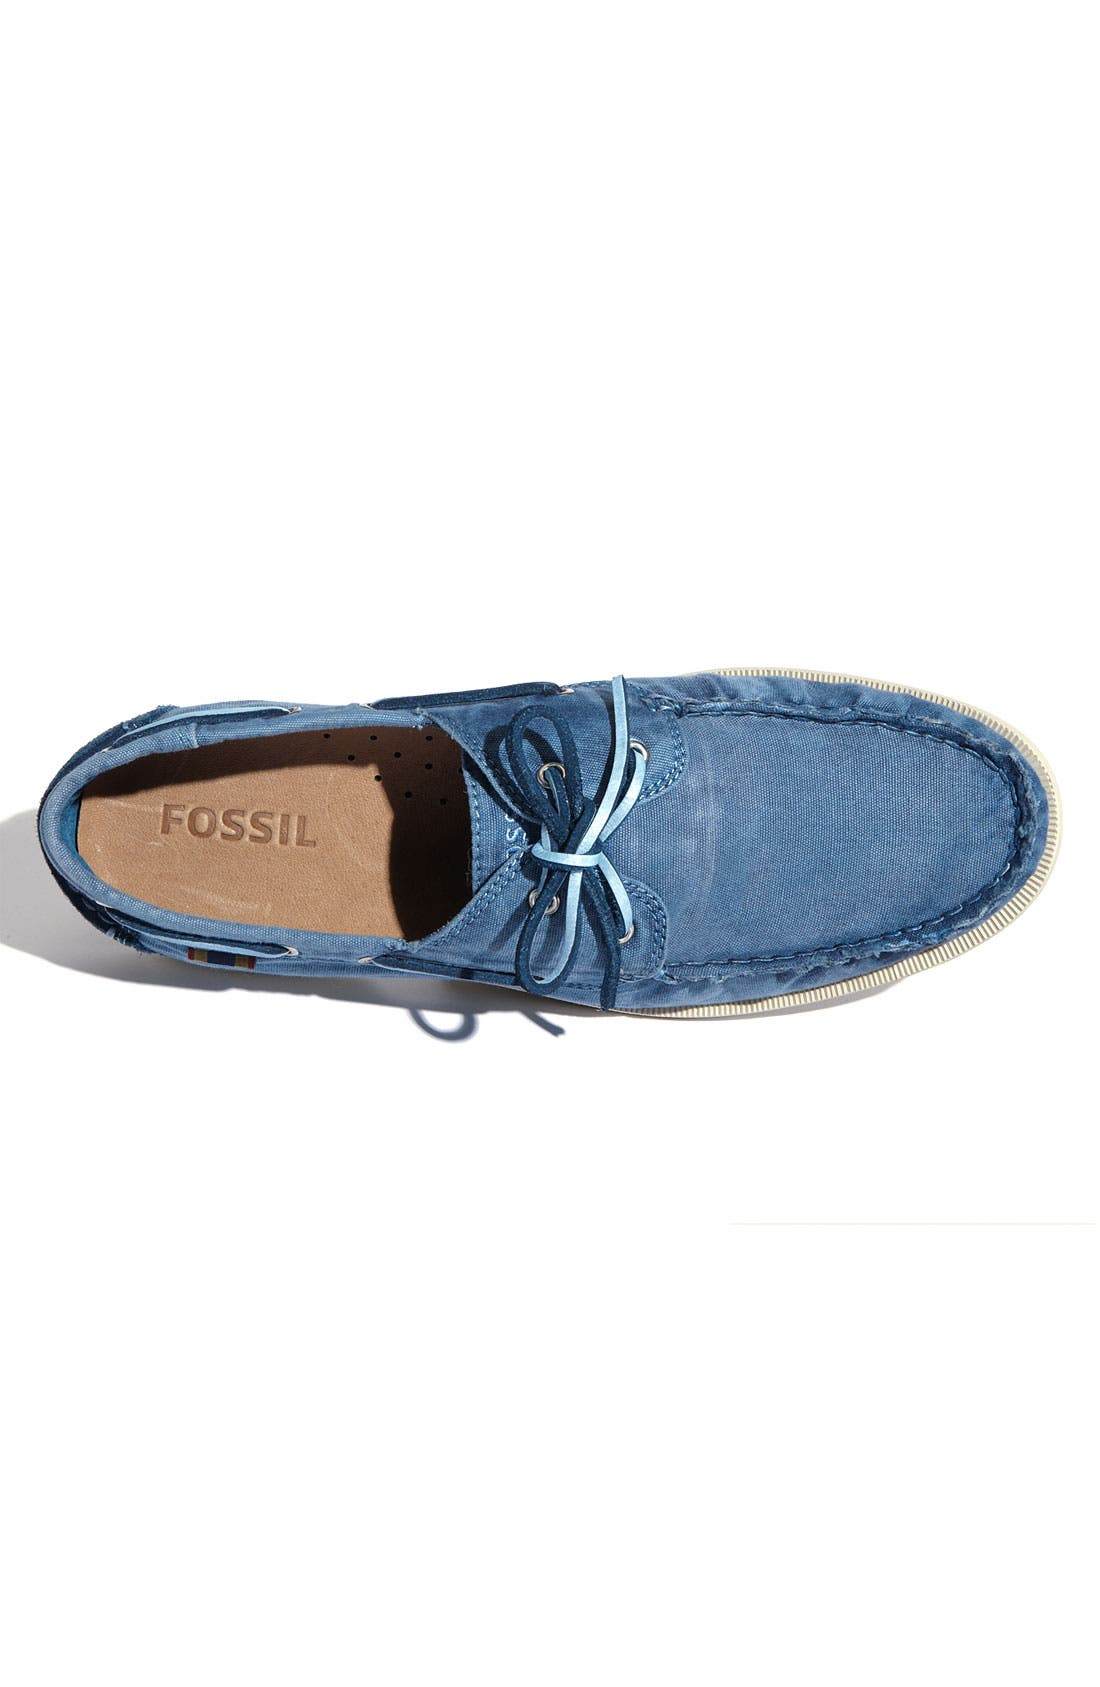 Alternate Image 3  - Fossil 'Bruno' Boat Shoe Oxford